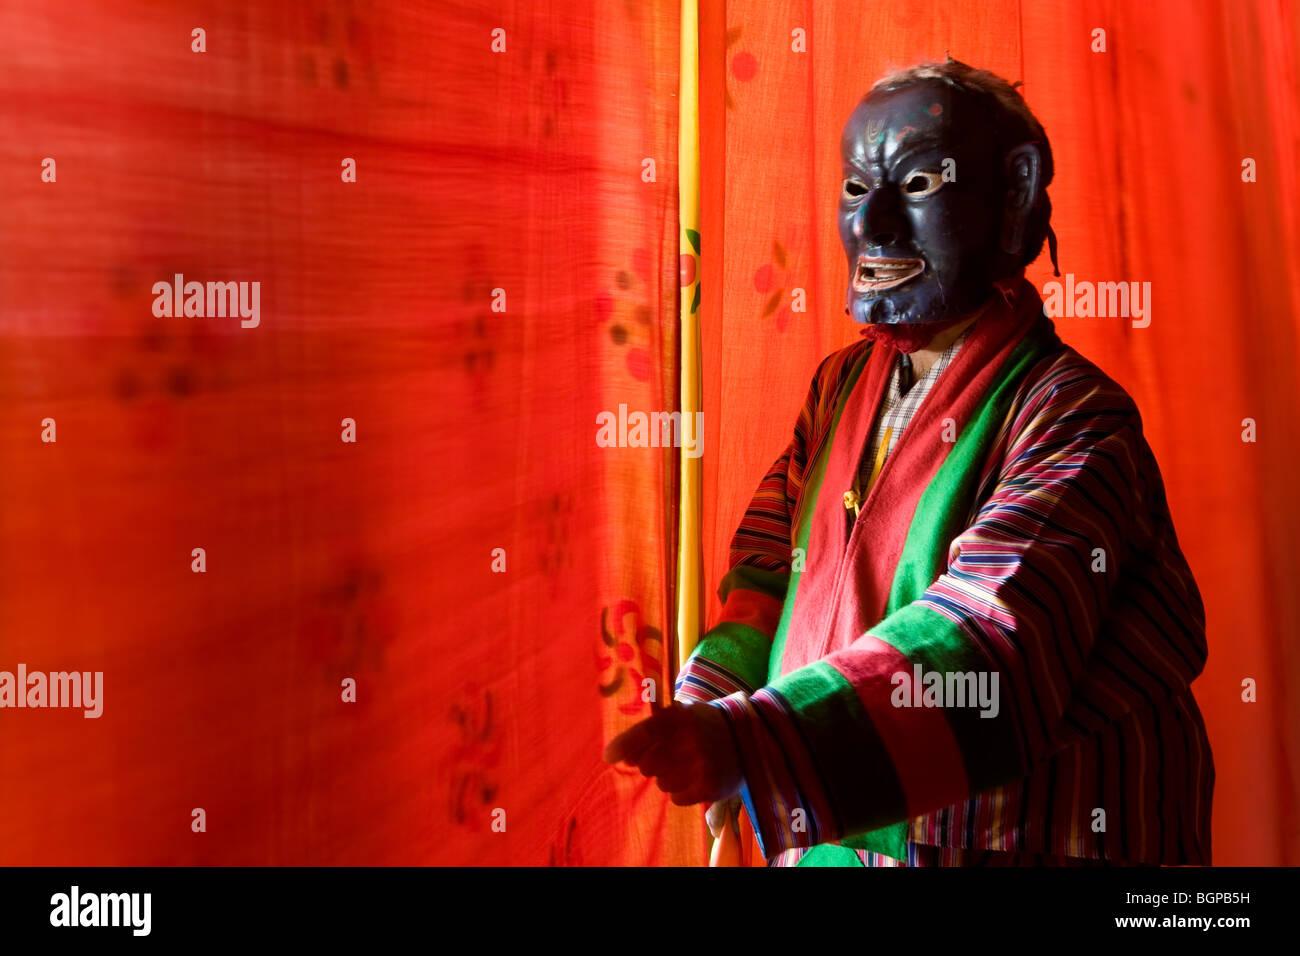 Homme masqué, Festival, Trashichhoe Dzong (monastère), Thimpu, Bhoutan Photo Stock